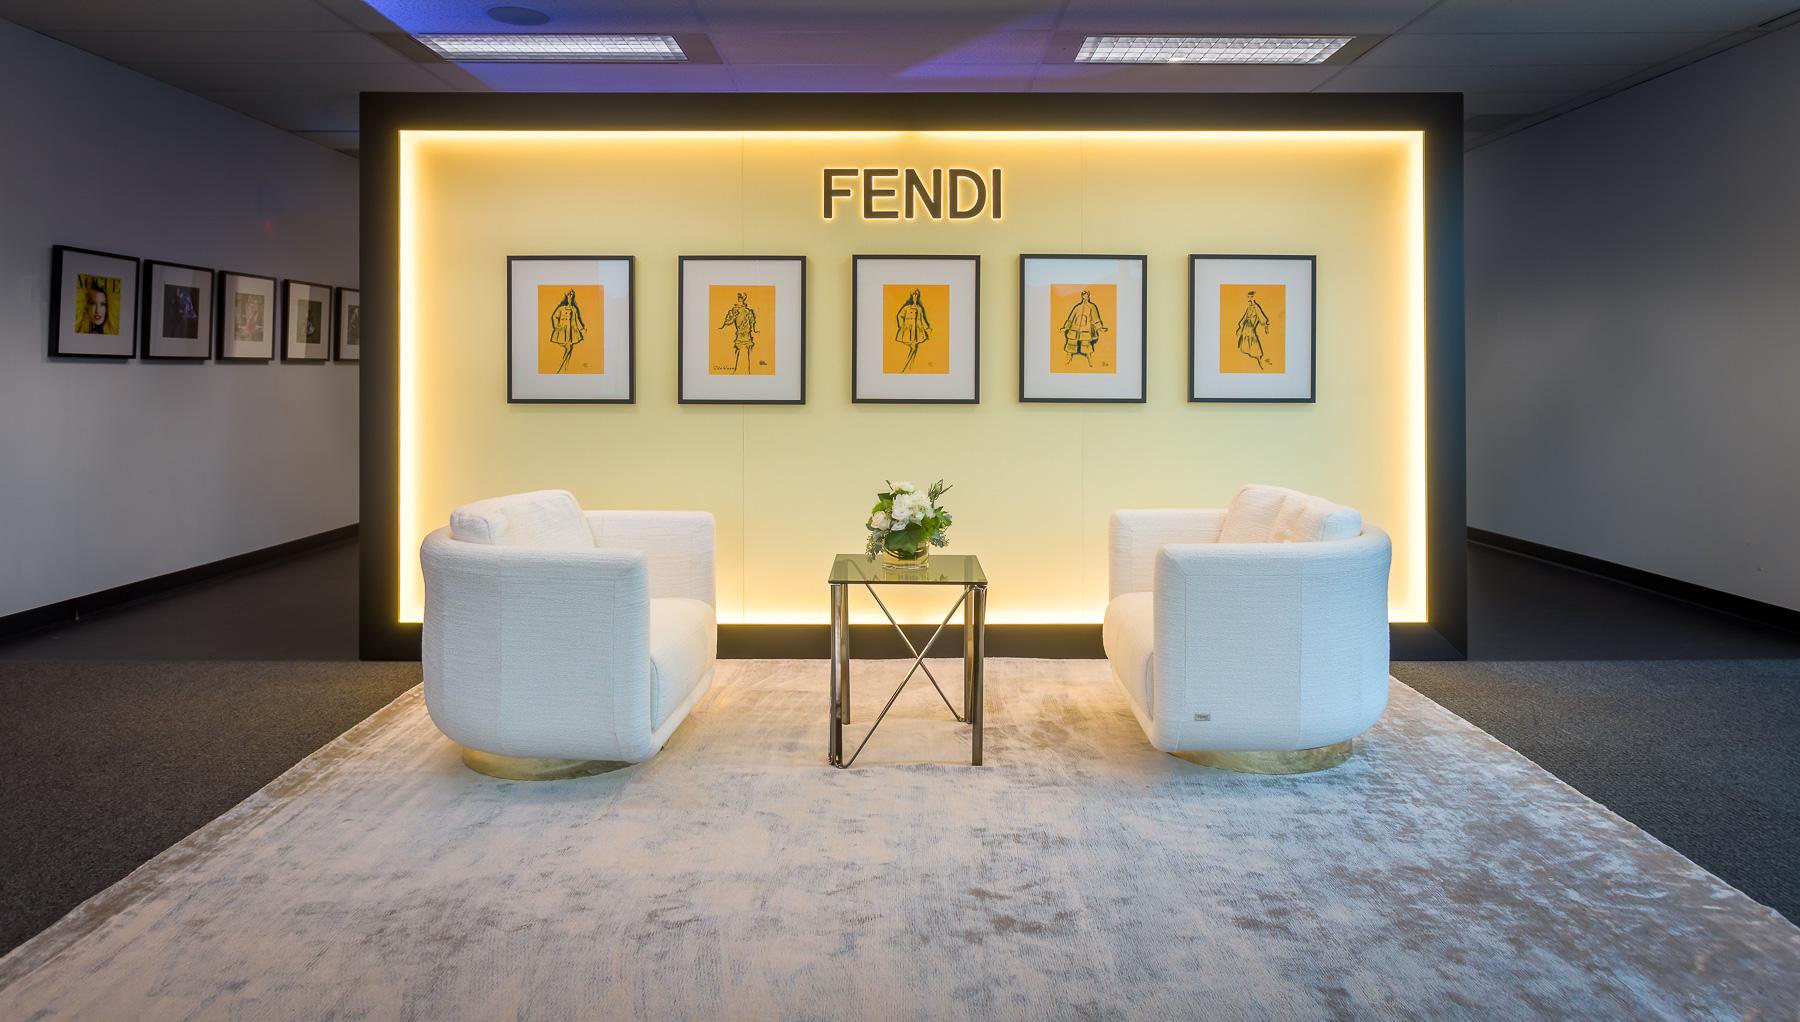 FENDI-4077.jpg